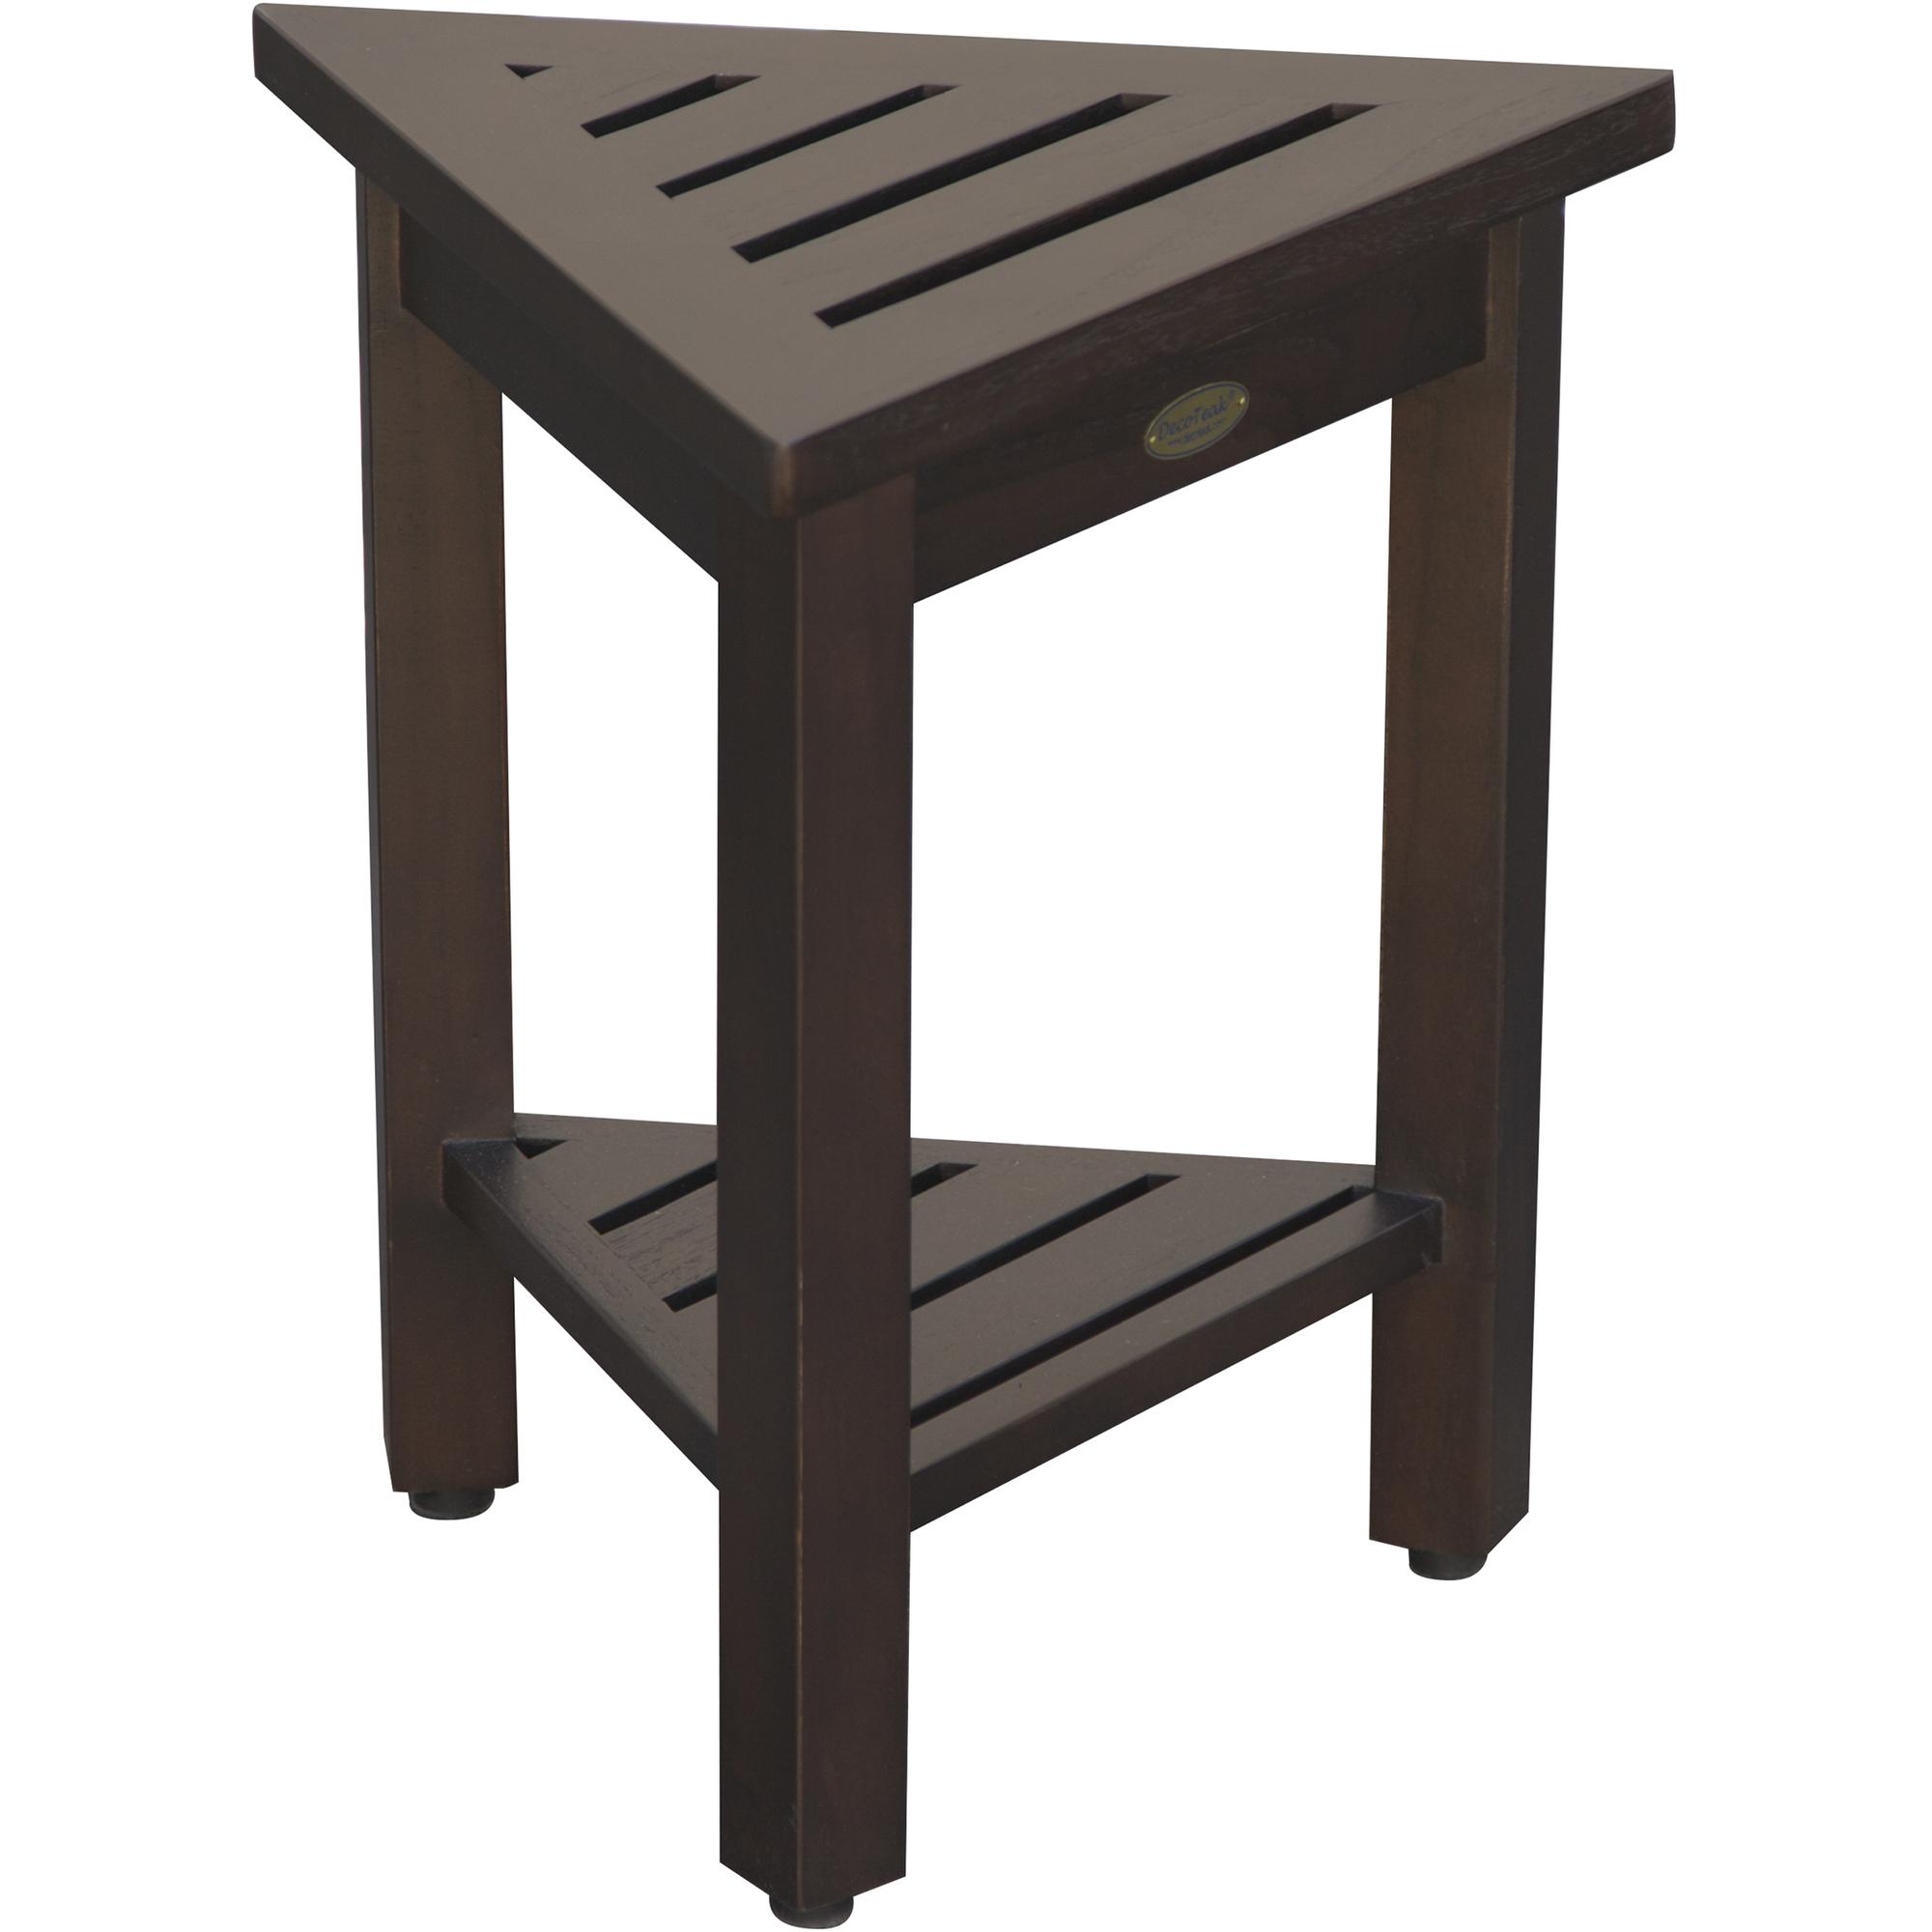 "18"" Teak Corner Shower Stool or Bench with Shelf in Brown Finish"